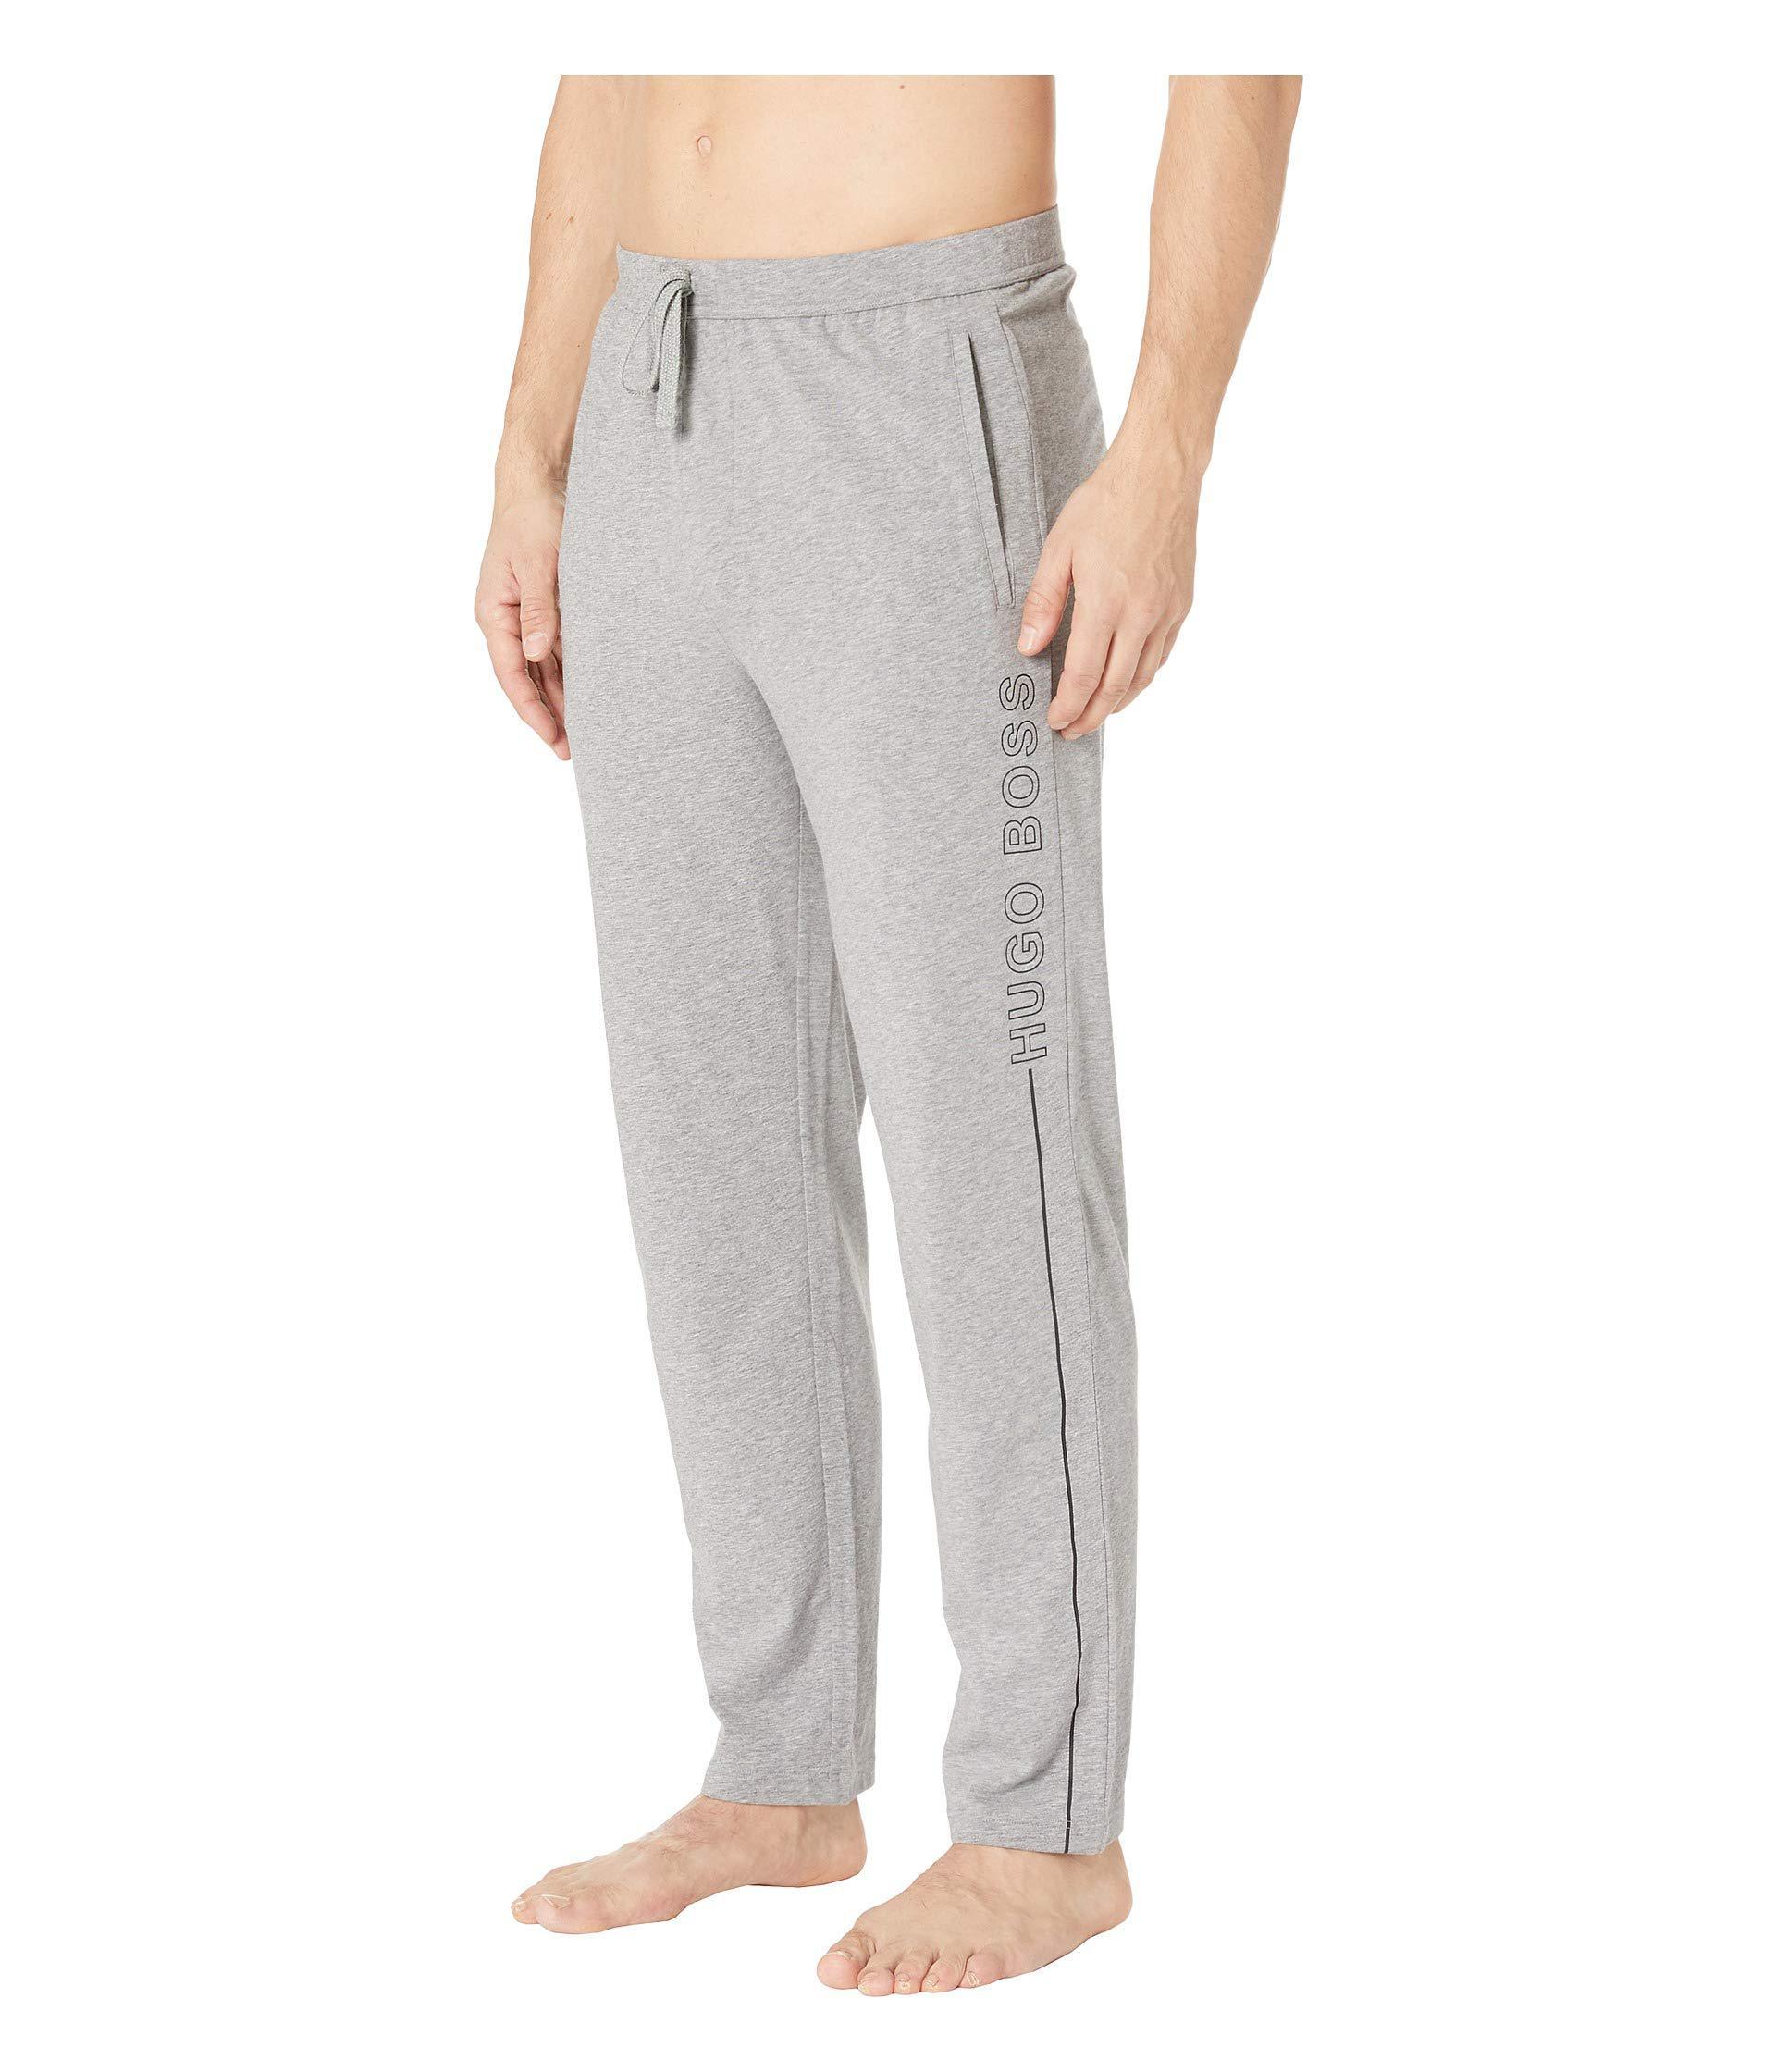 26a9cdd34 BOSS Identity Pants 10143871 04 (navy) Men's Pajama in Gray for Men ...